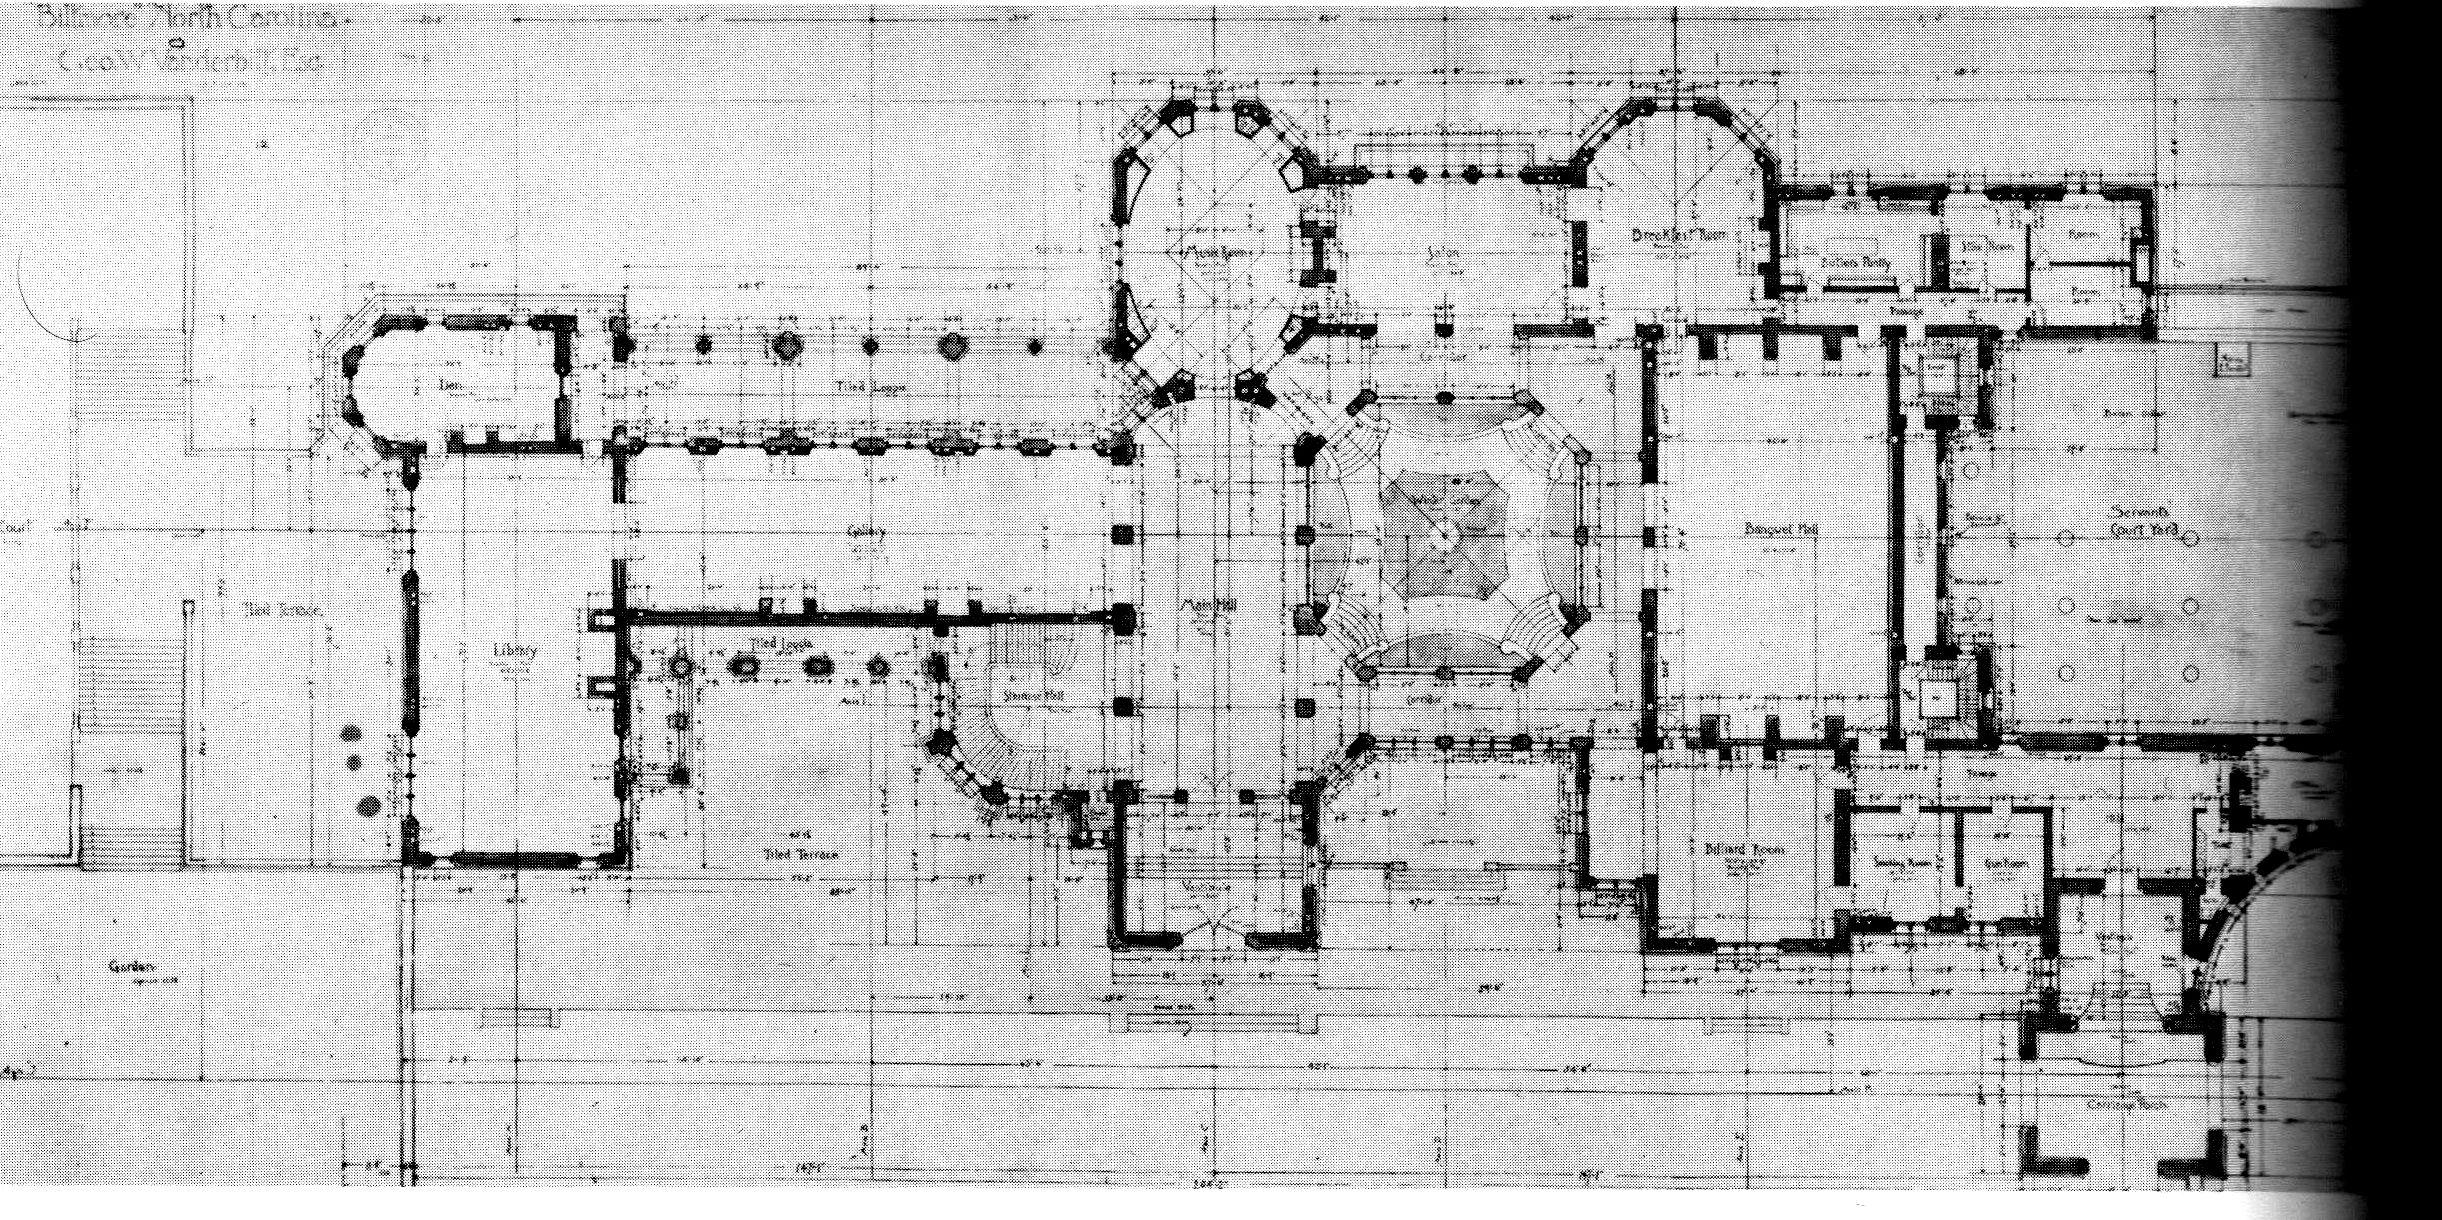 Floor Plan Scan An American Castle The Biltmore Estate Located In Ashville Nc Biltmore Estate Biltmore Estate Asheville Biltmore Estate Asheville Nc